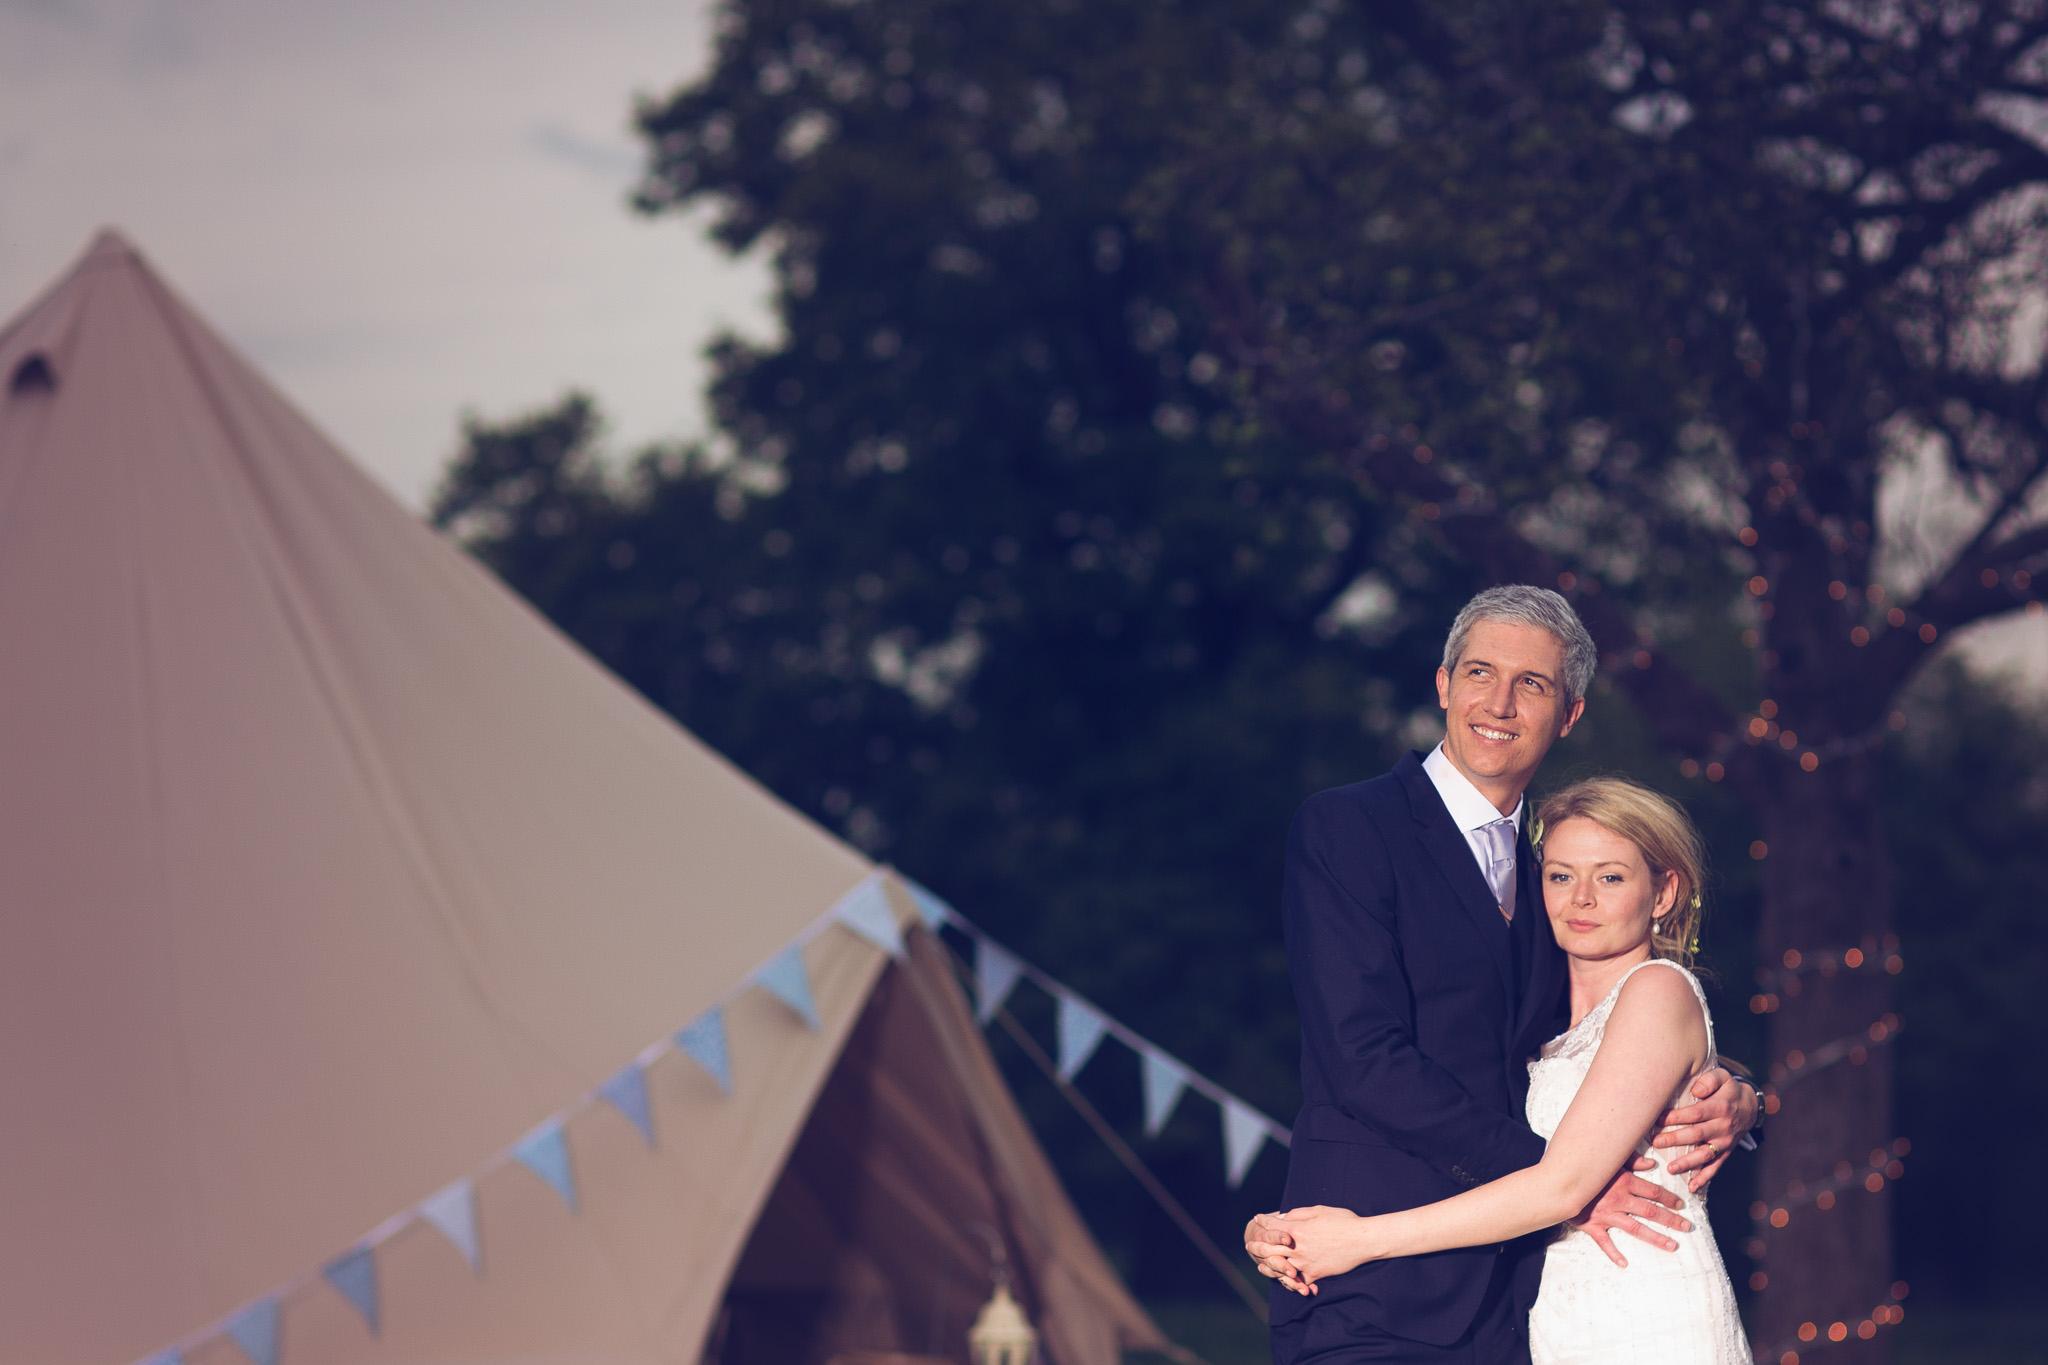 Mark_Barnes_Gloucester_Wedding_Photographer_Elmore_Court_Wedding_Photography_Mike+Kelly-90.jpg